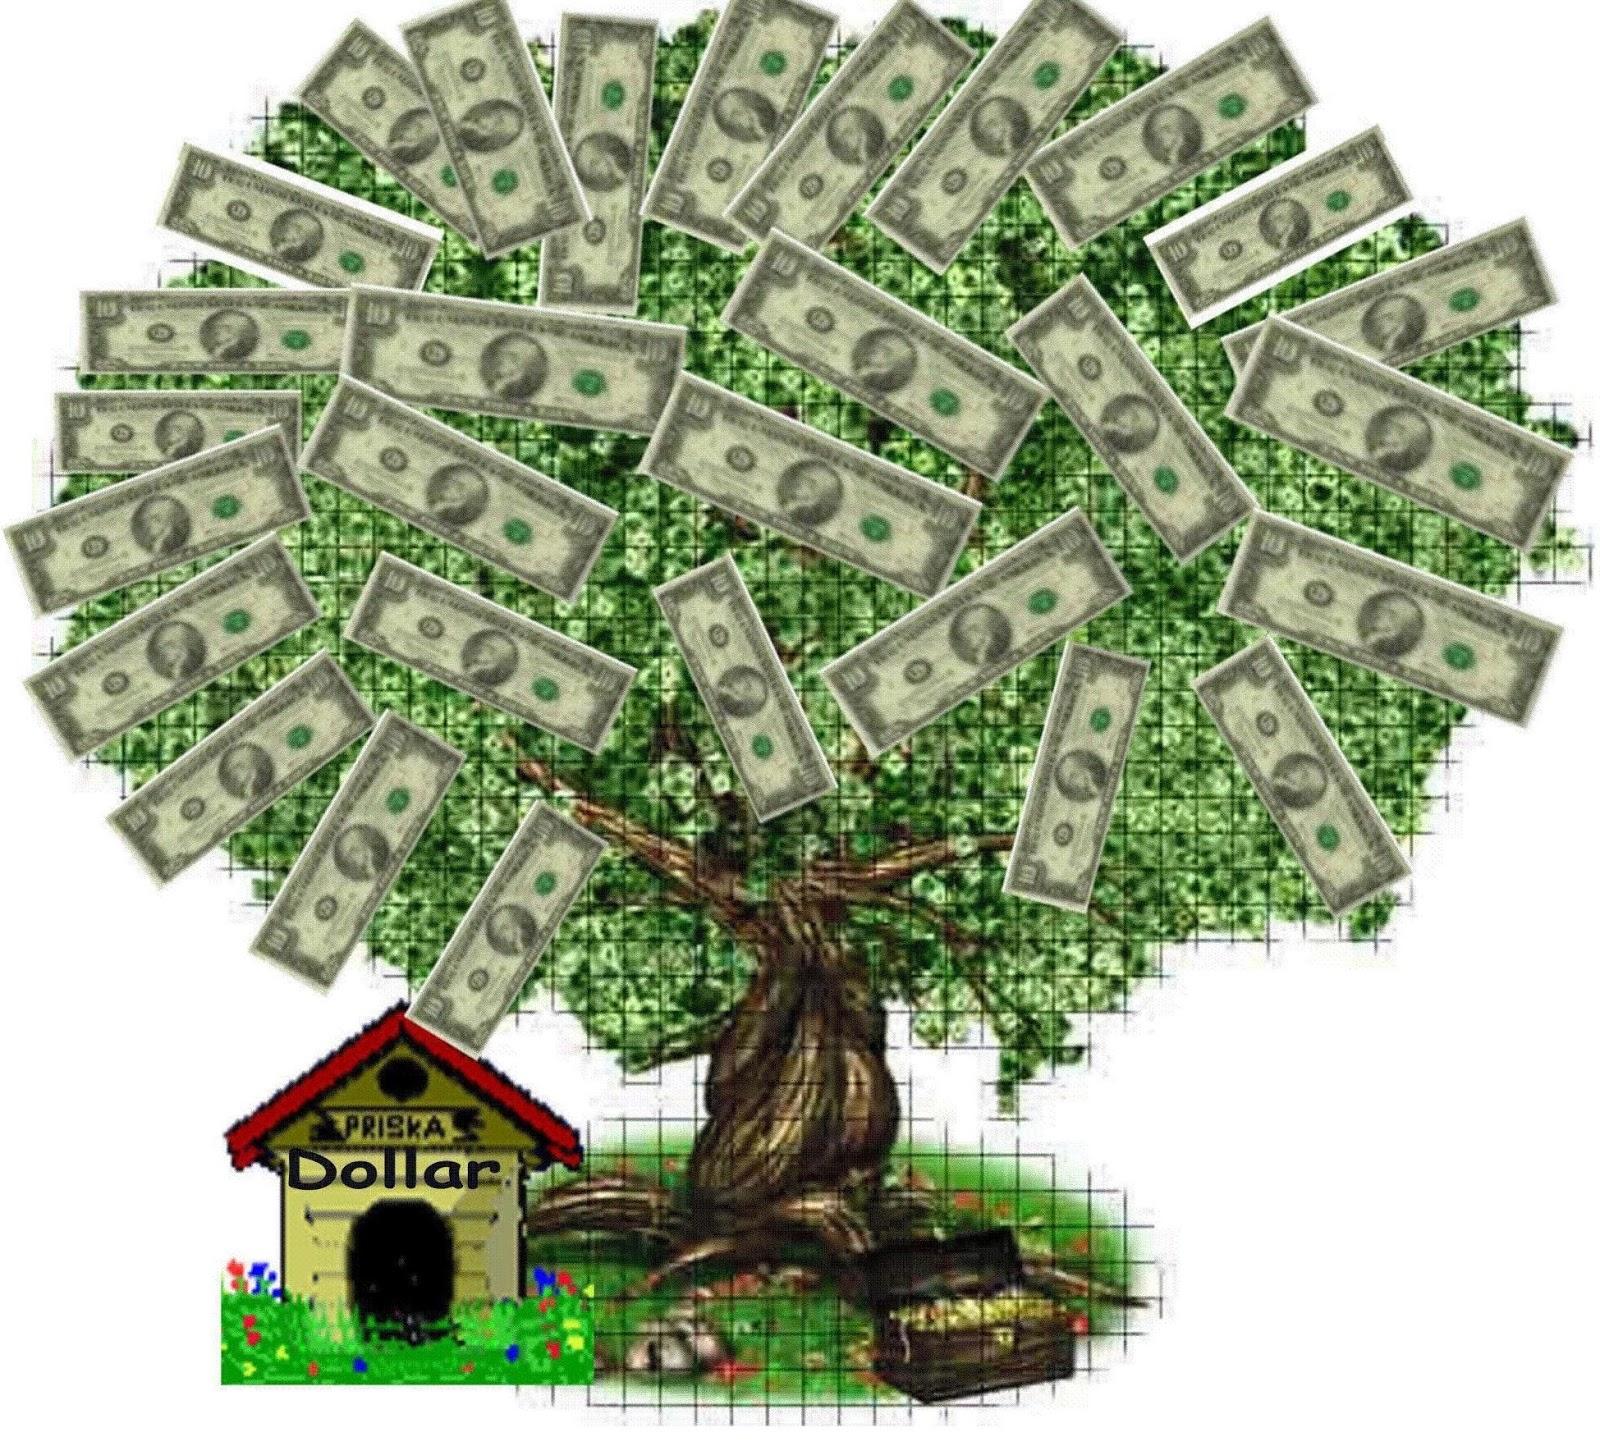 The Money Tree Montgomery Community Media